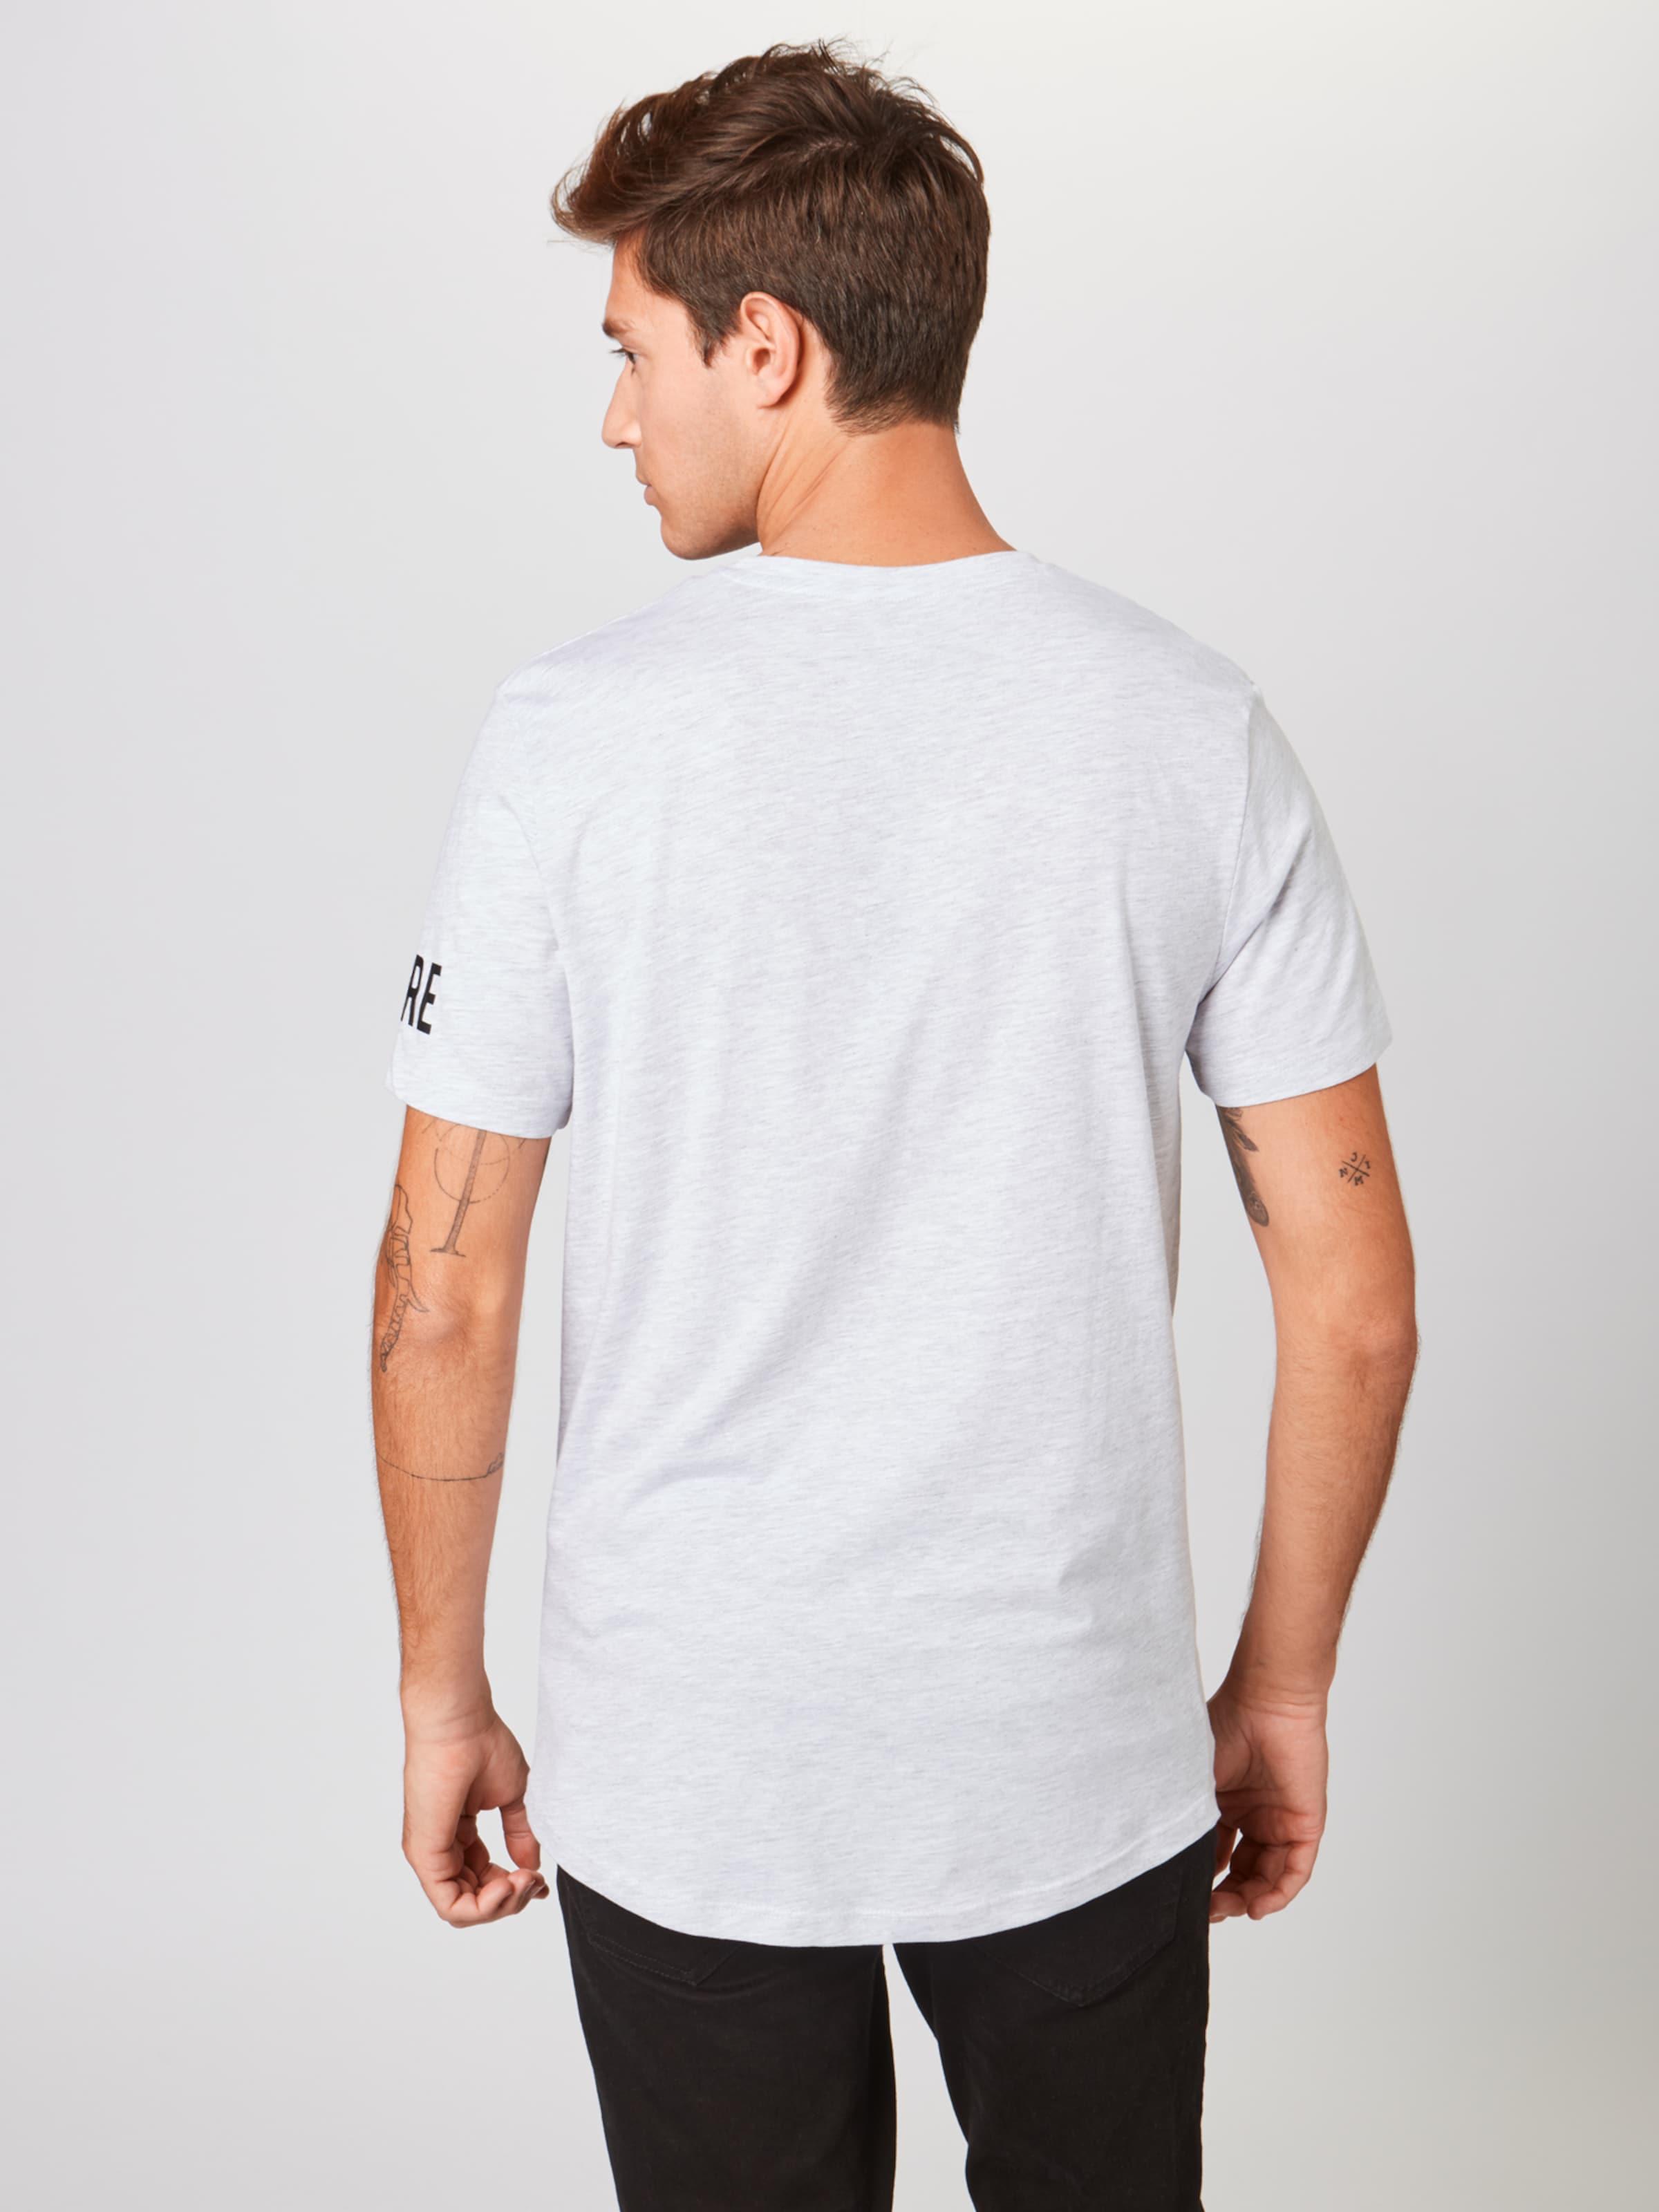 Hellgrau In shirt Jackamp; T Fut' Jones 'jcobooster DIWYeEHb29